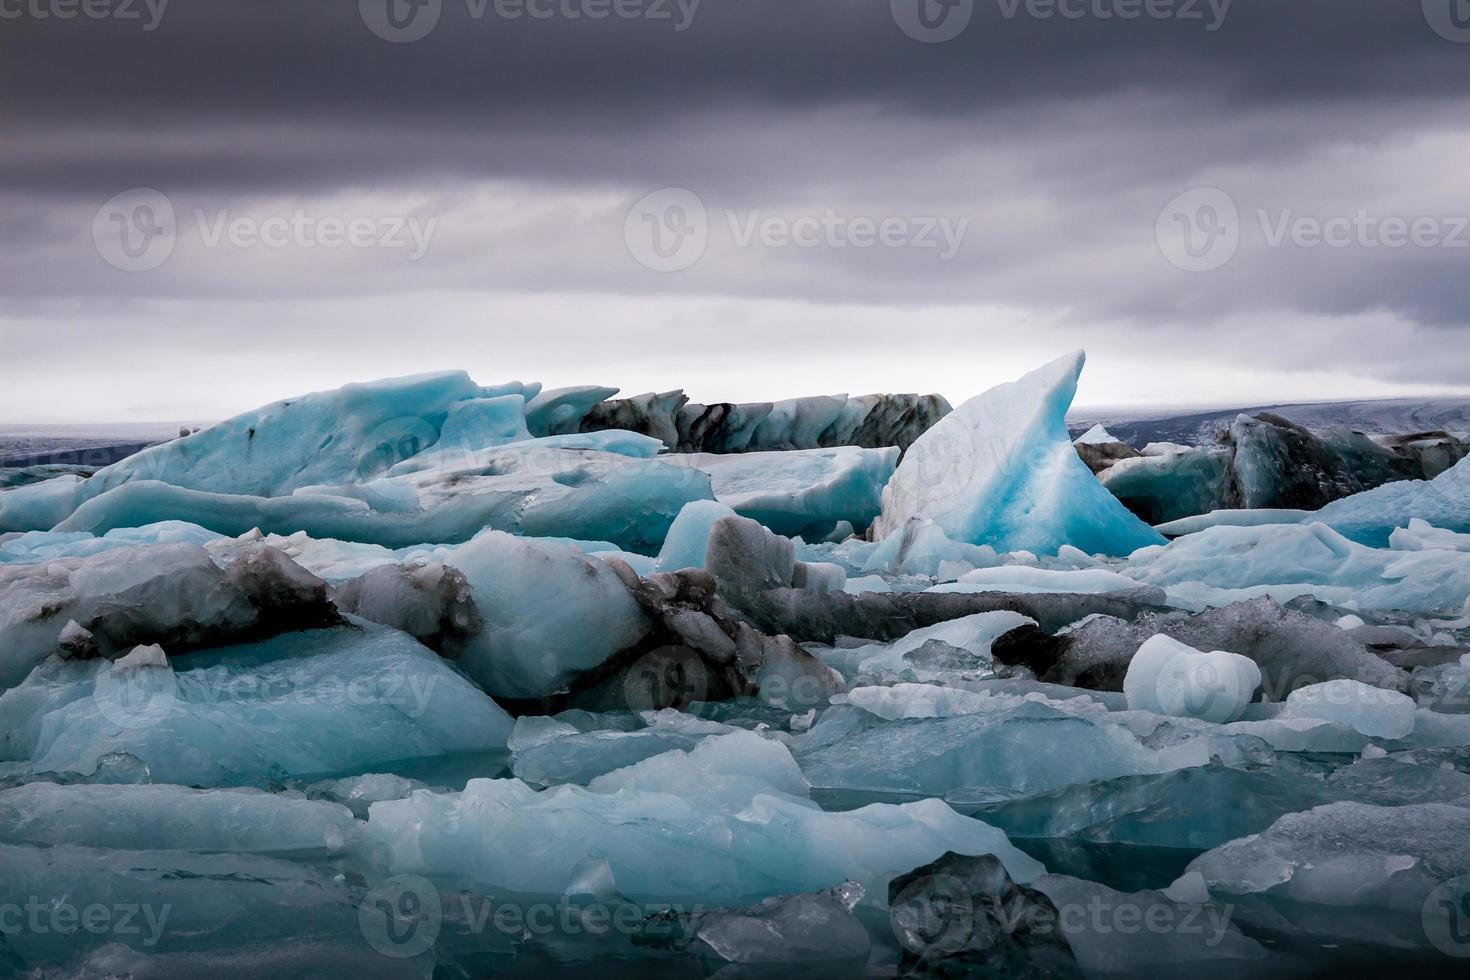 incrível lago glacial jokulsarlon cheio de flutuando e derretendo i foto